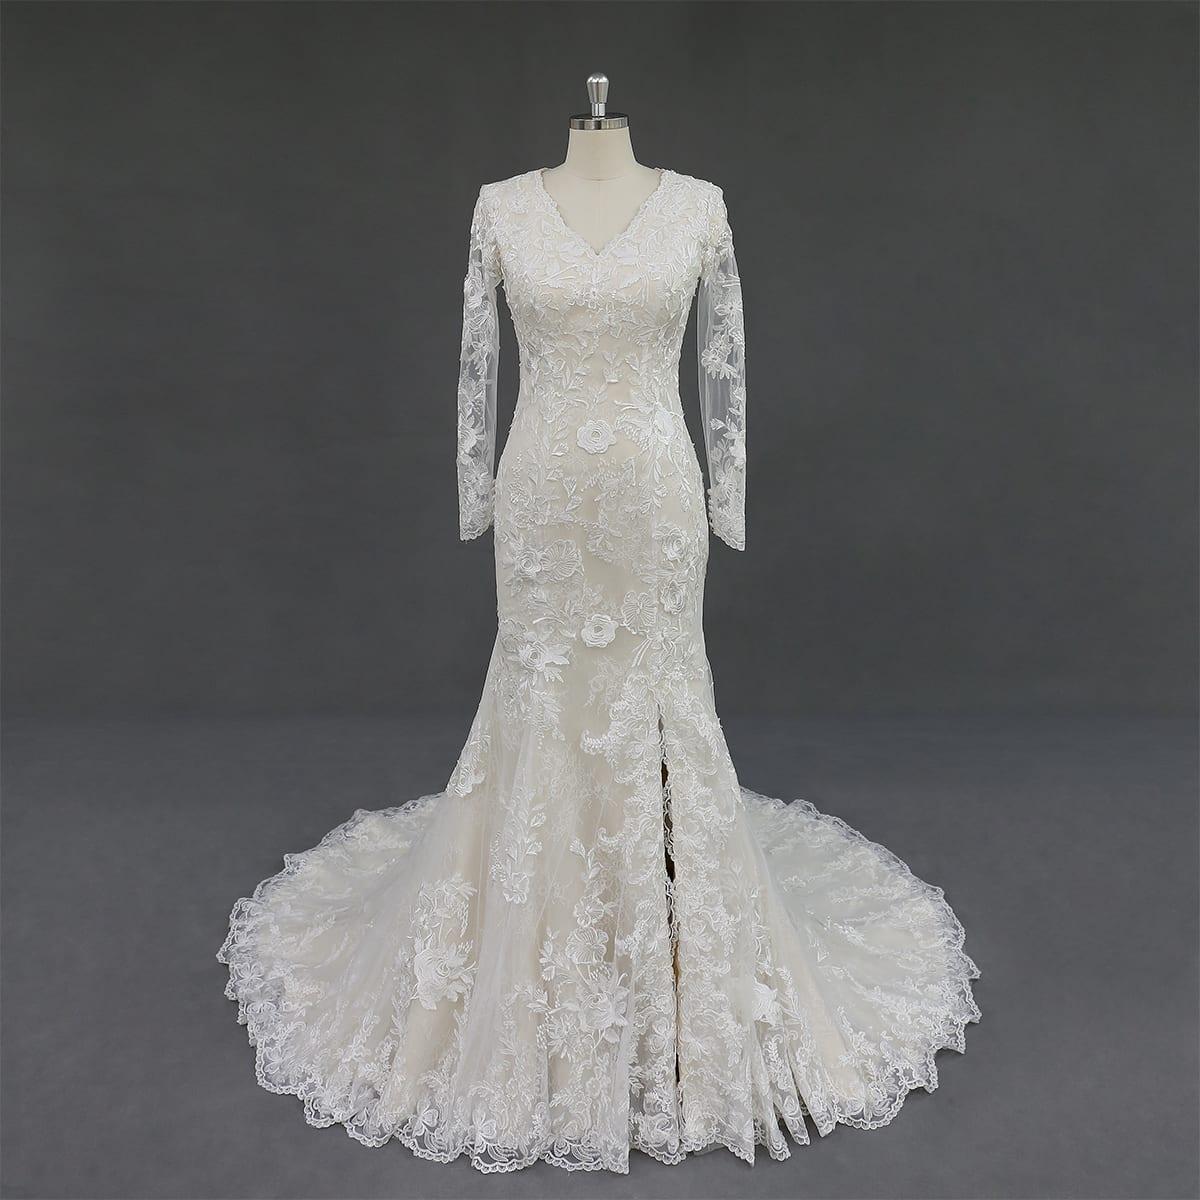 Ja8997 Flower Lace Pattern Wedding Dresses From Darius Cordell: Pattern Wedding Dress Shapes At Websimilar.org